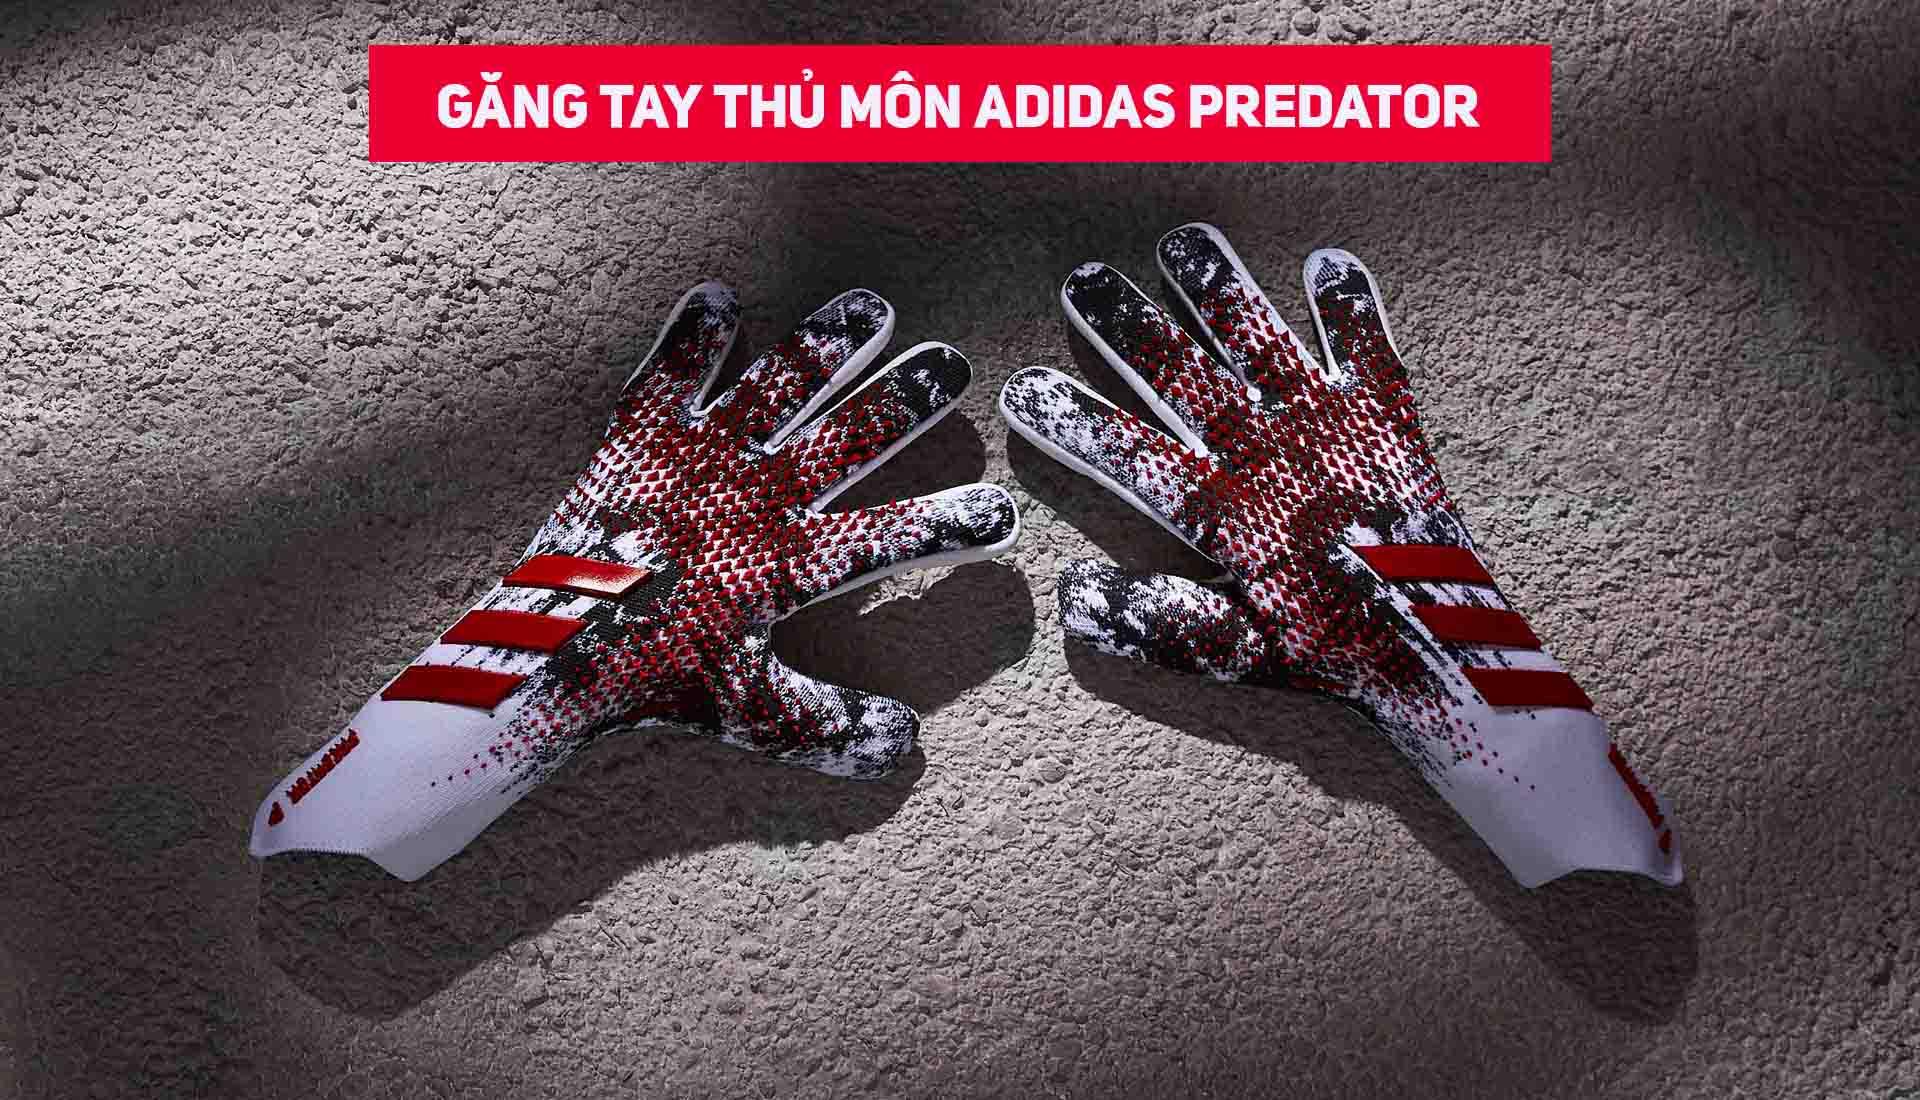 Gang tay thu mon Manuel Neuer khong day predator (1)